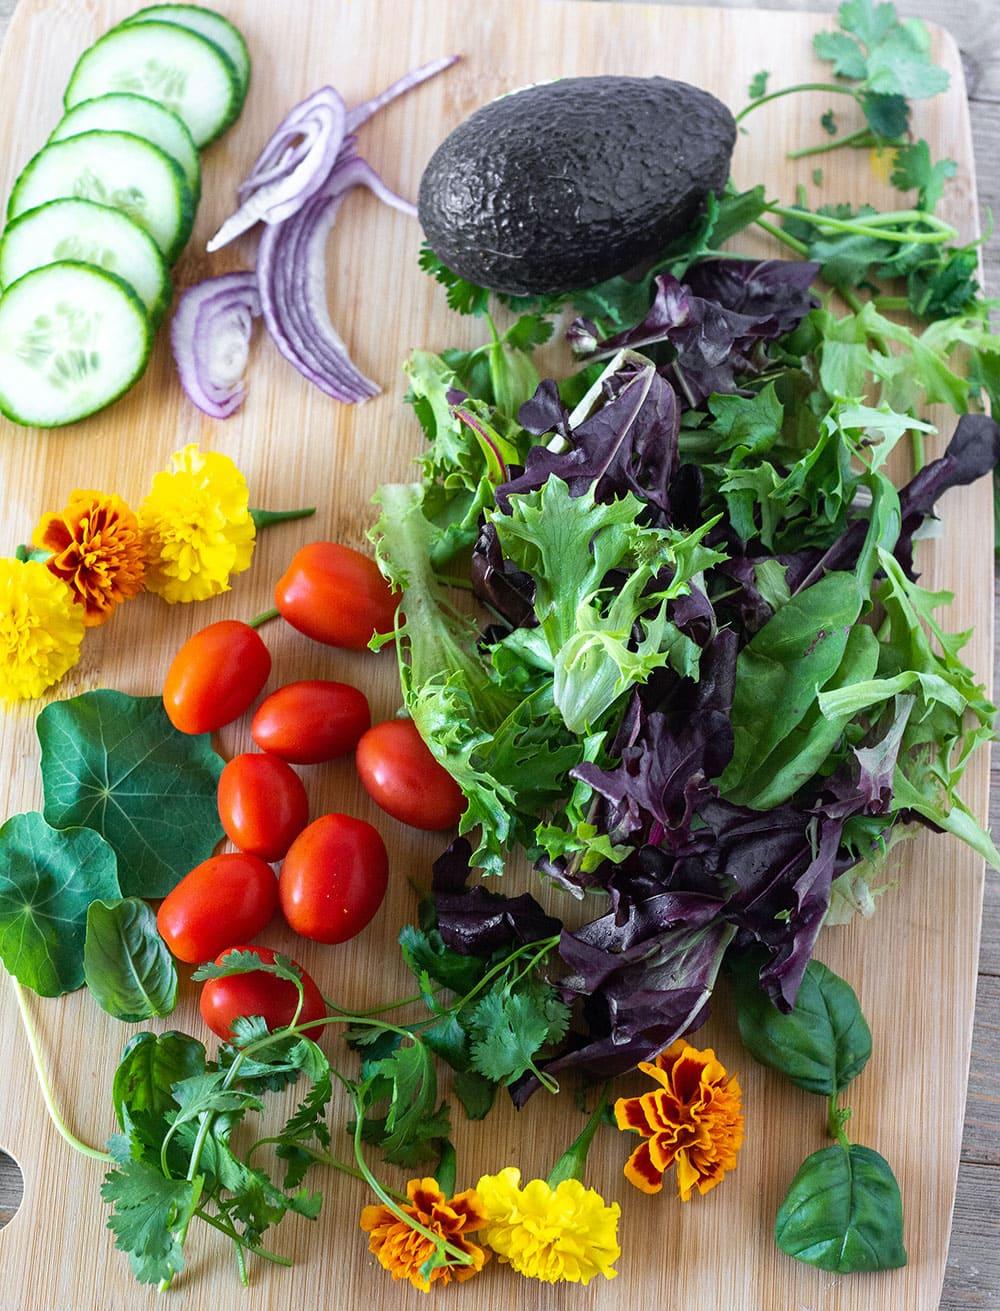 Fresh ingredients for spring mix salad